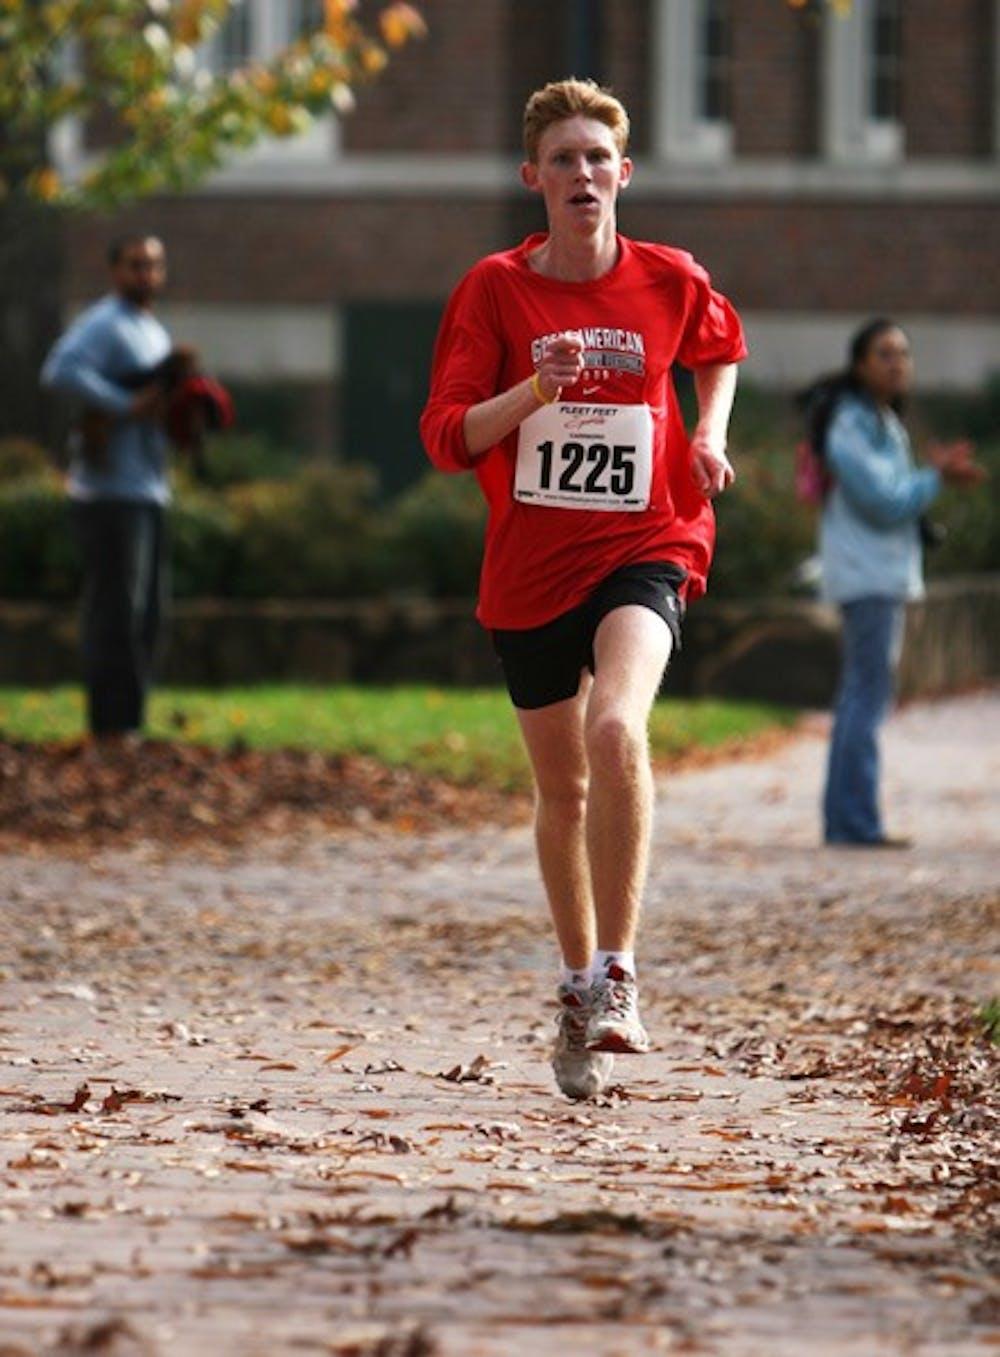 Running with spirit